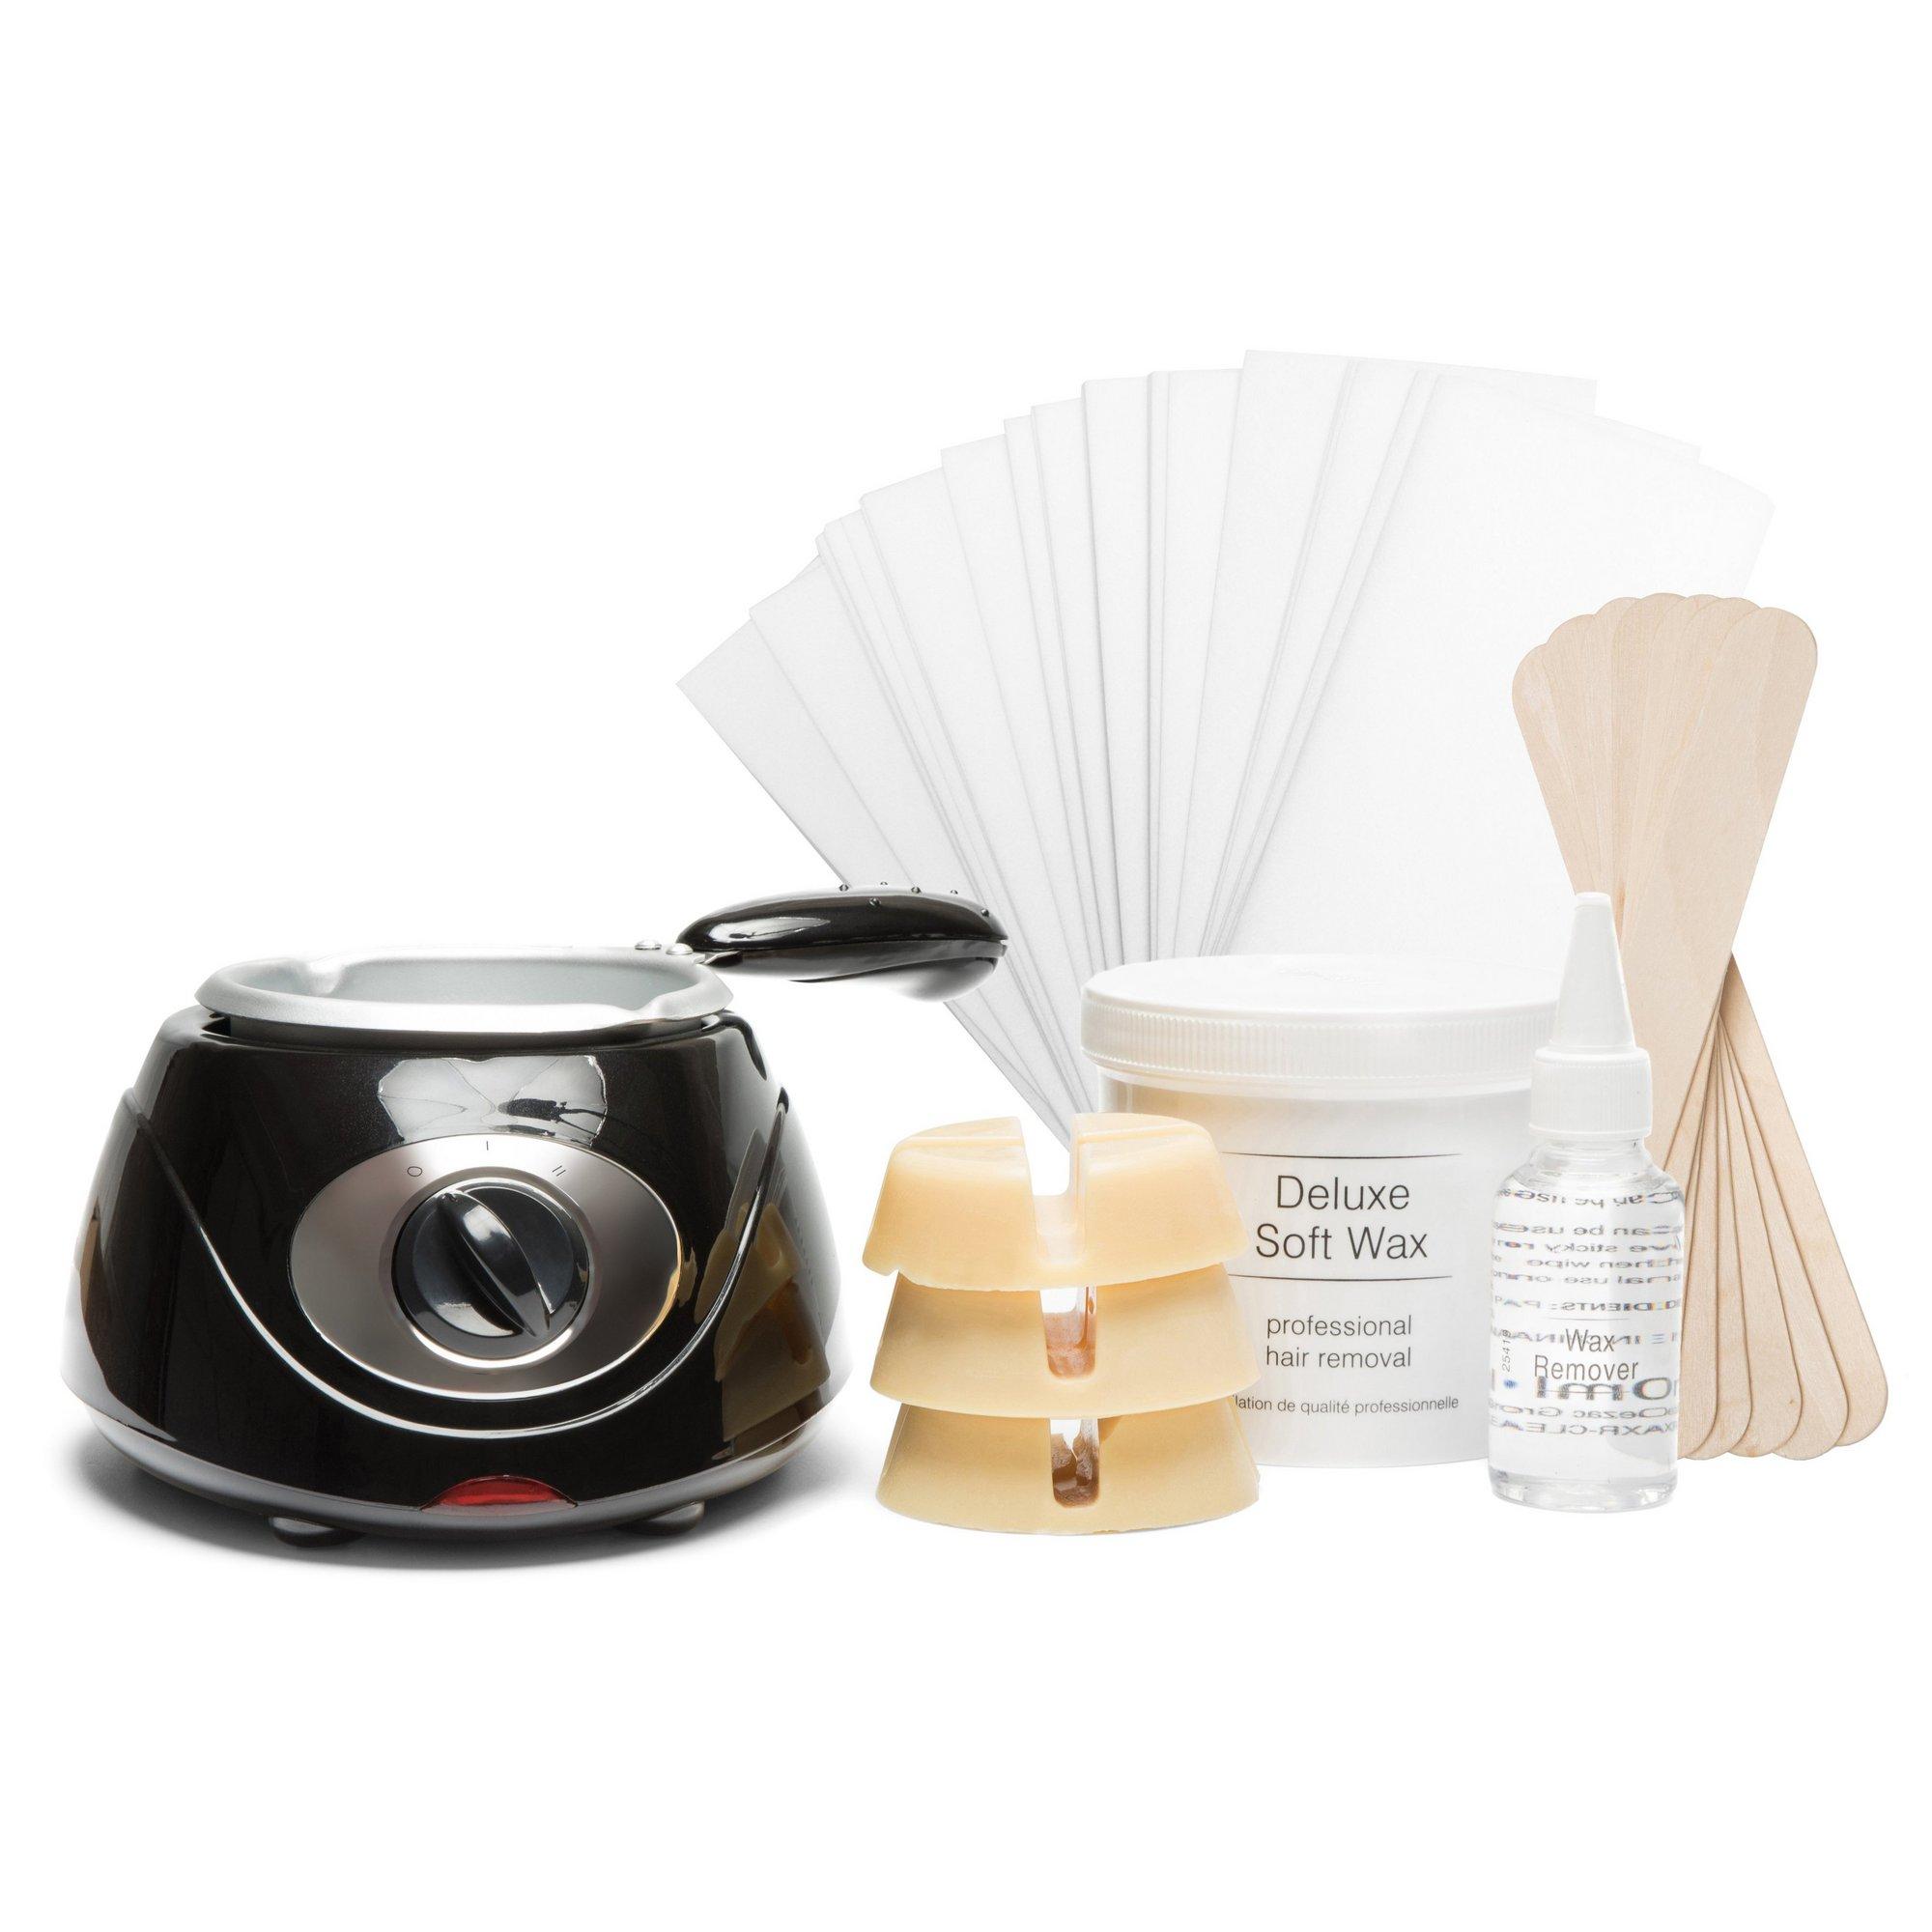 Image of Rio Total Body Waxing Kit